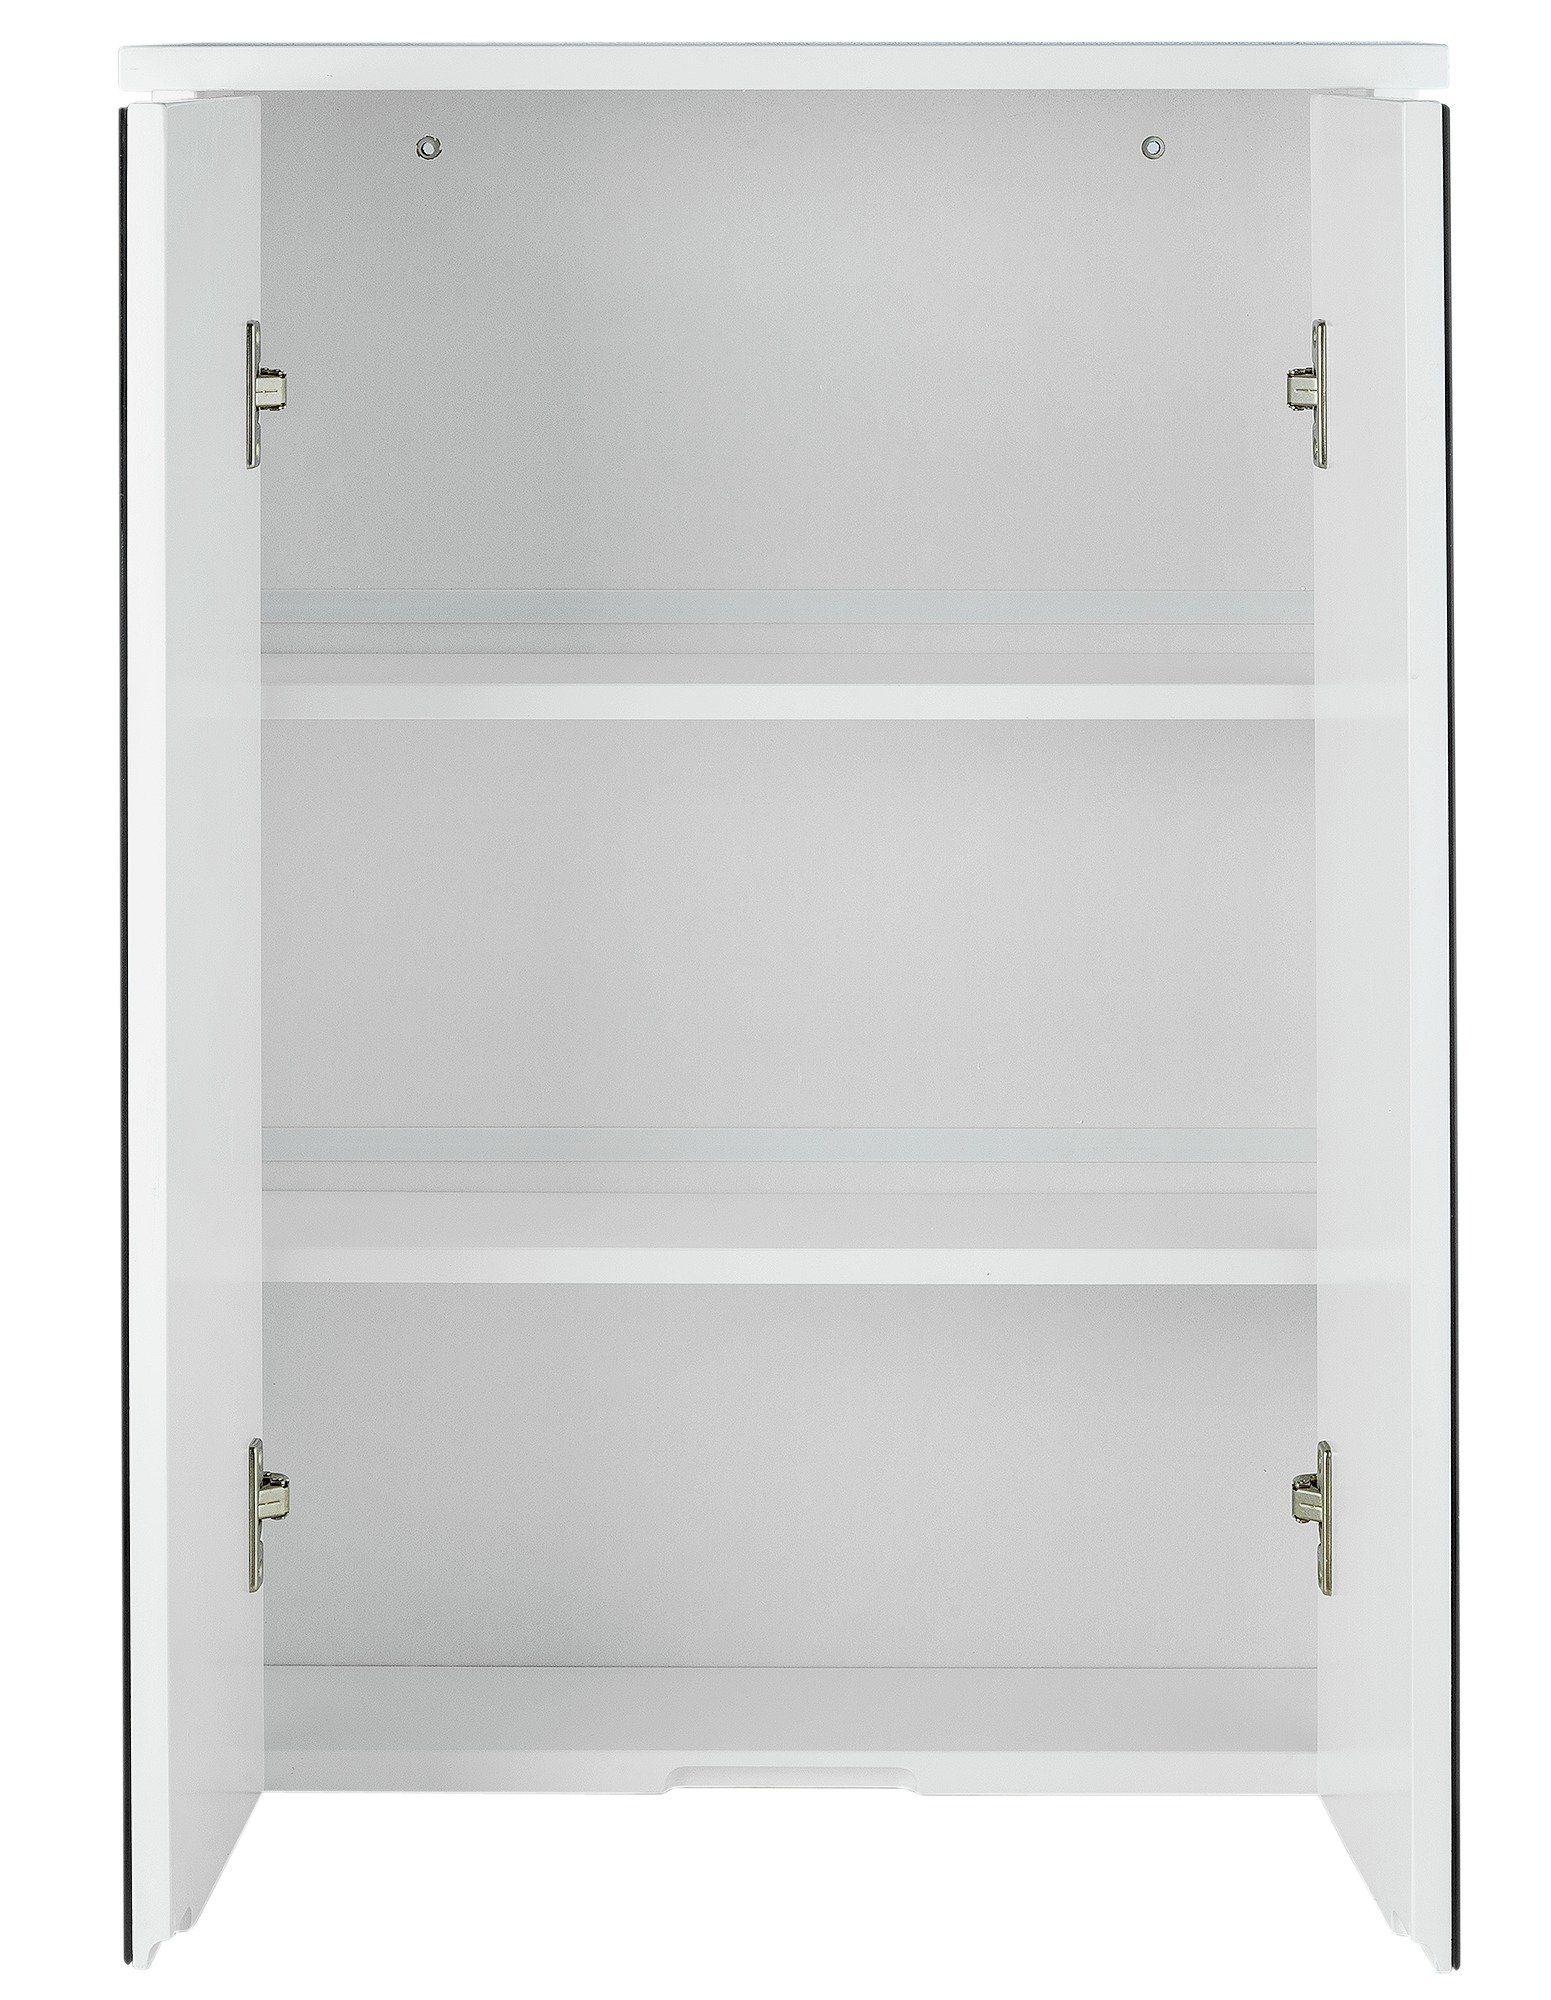 Mirrored Cabinet. Woodframe Mirrored Cabinet. Clover Black Mirrored ...